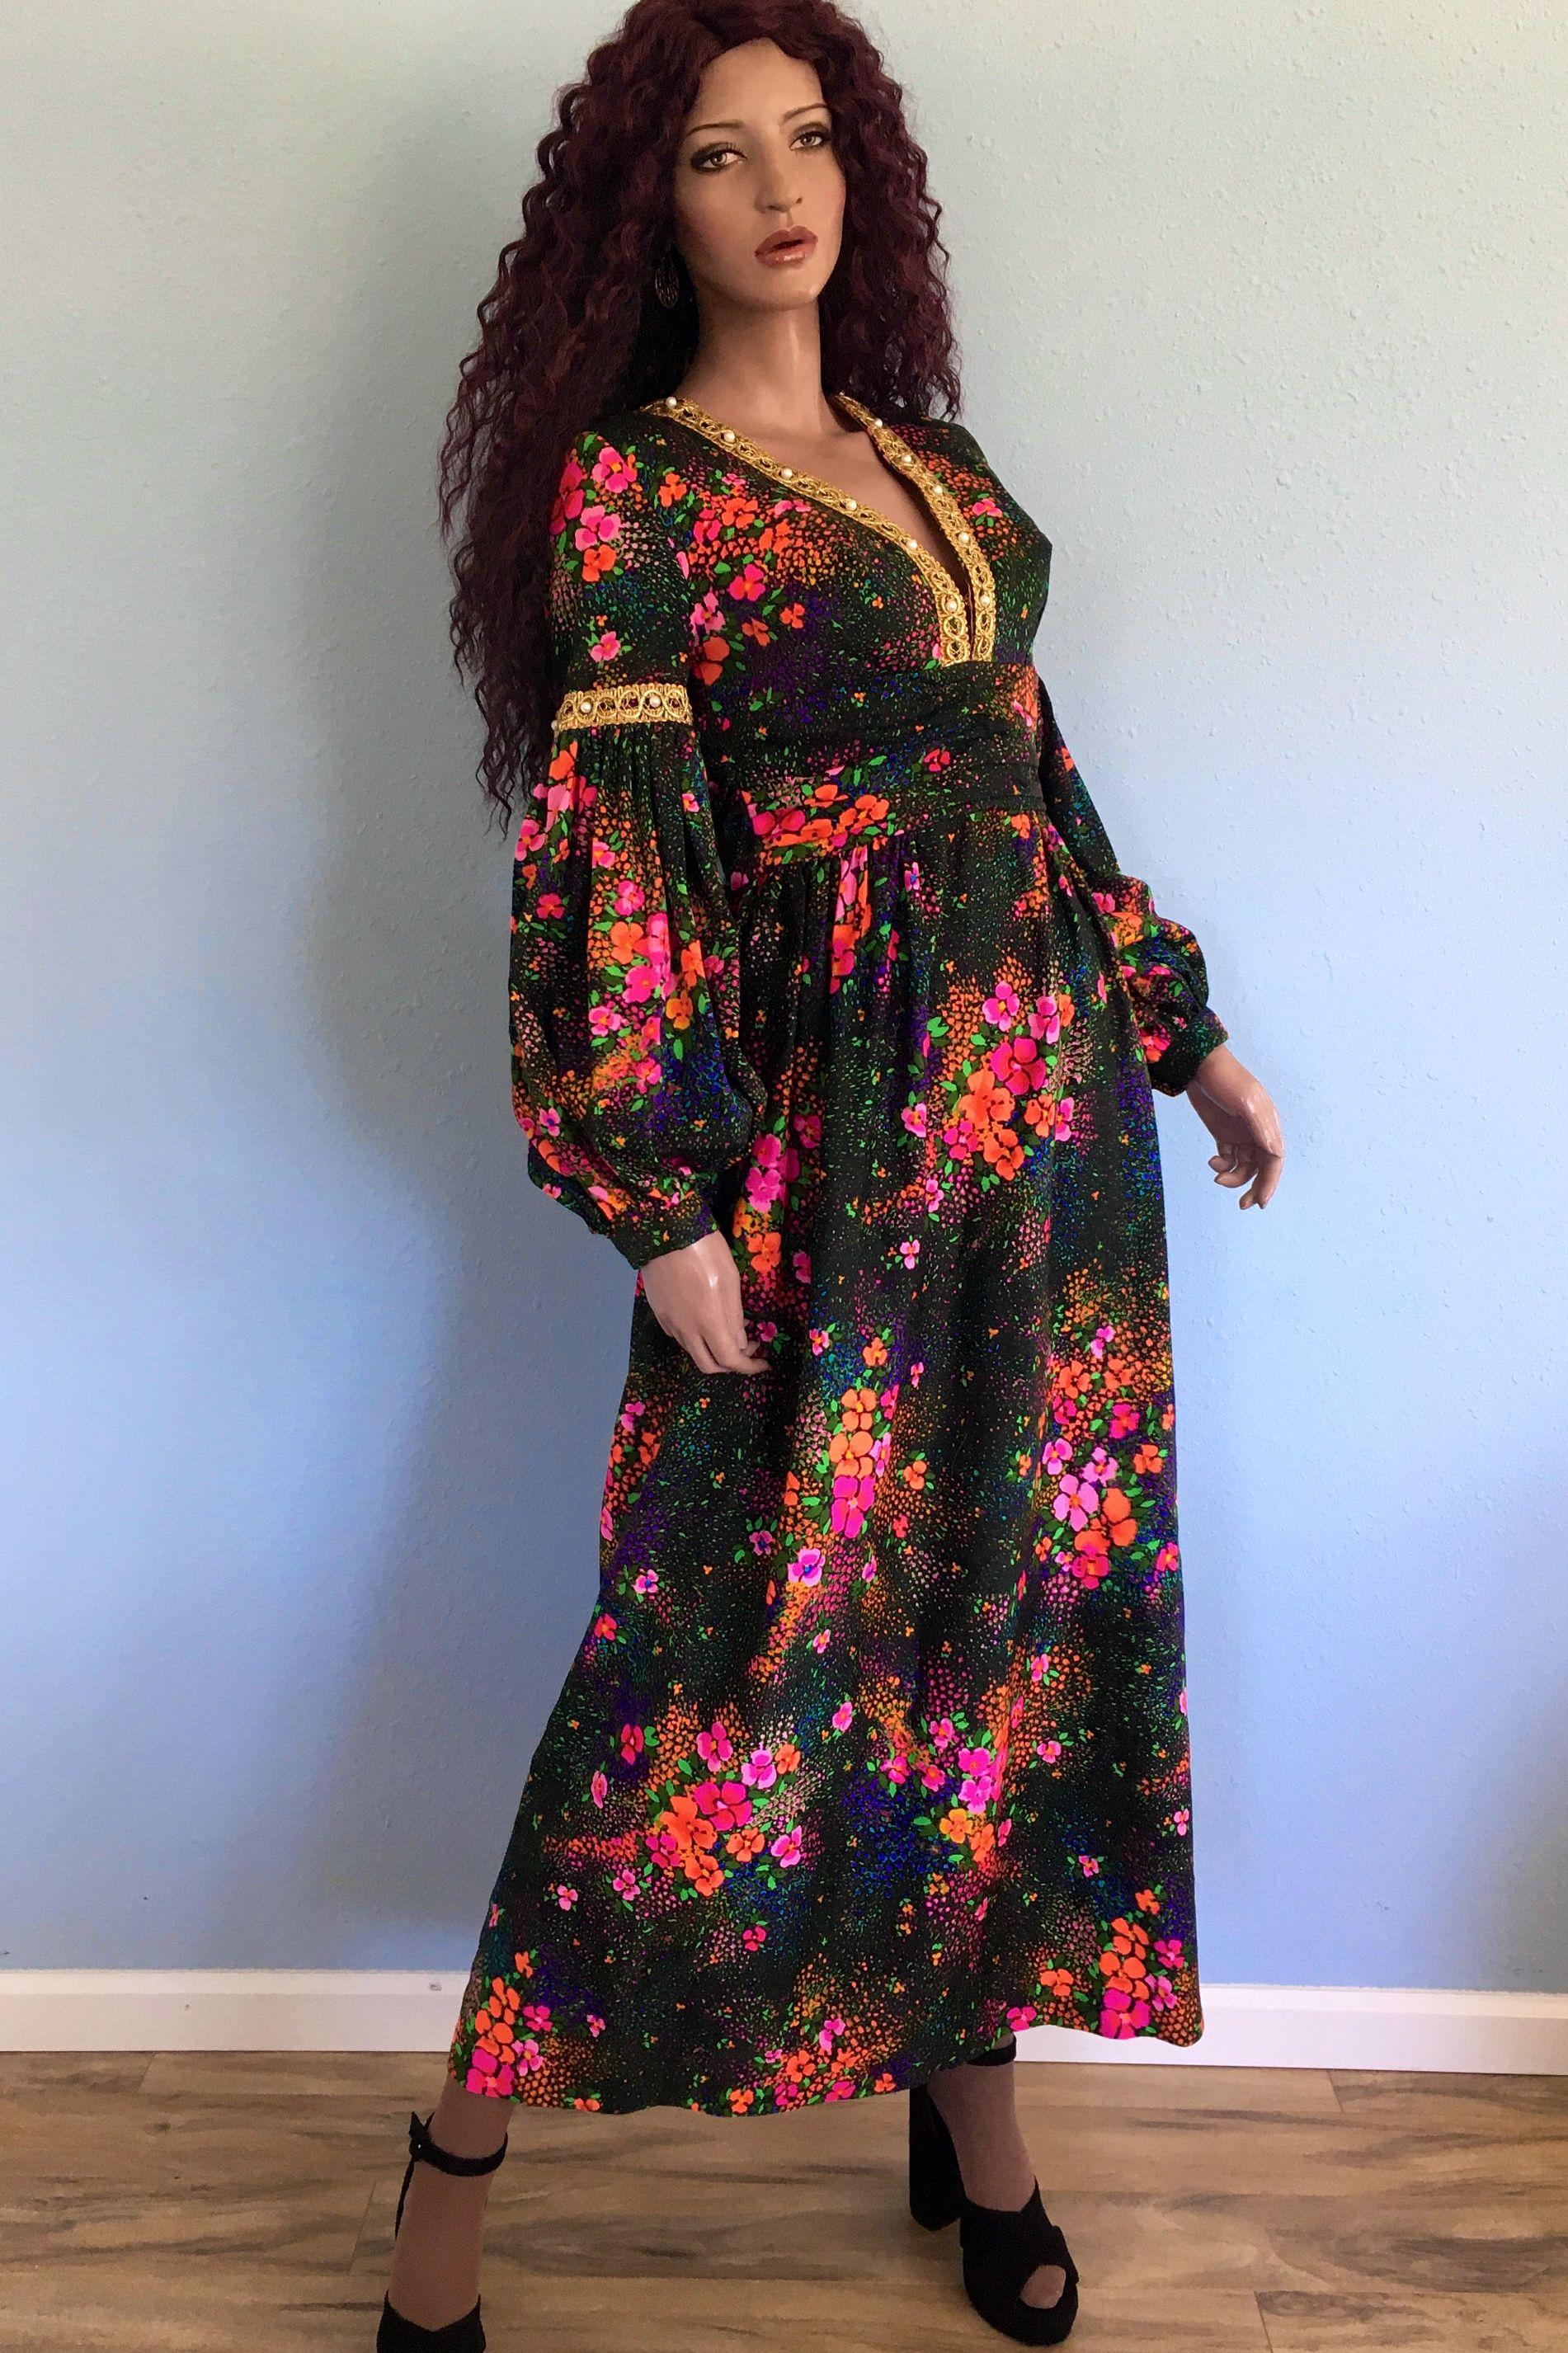 70s Psychedelic Barkcloth Maxi Dress Medium Vintage Boho Etsy Dresses Floral Outfit Women Dress Online [ 2853 x 1901 Pixel ]